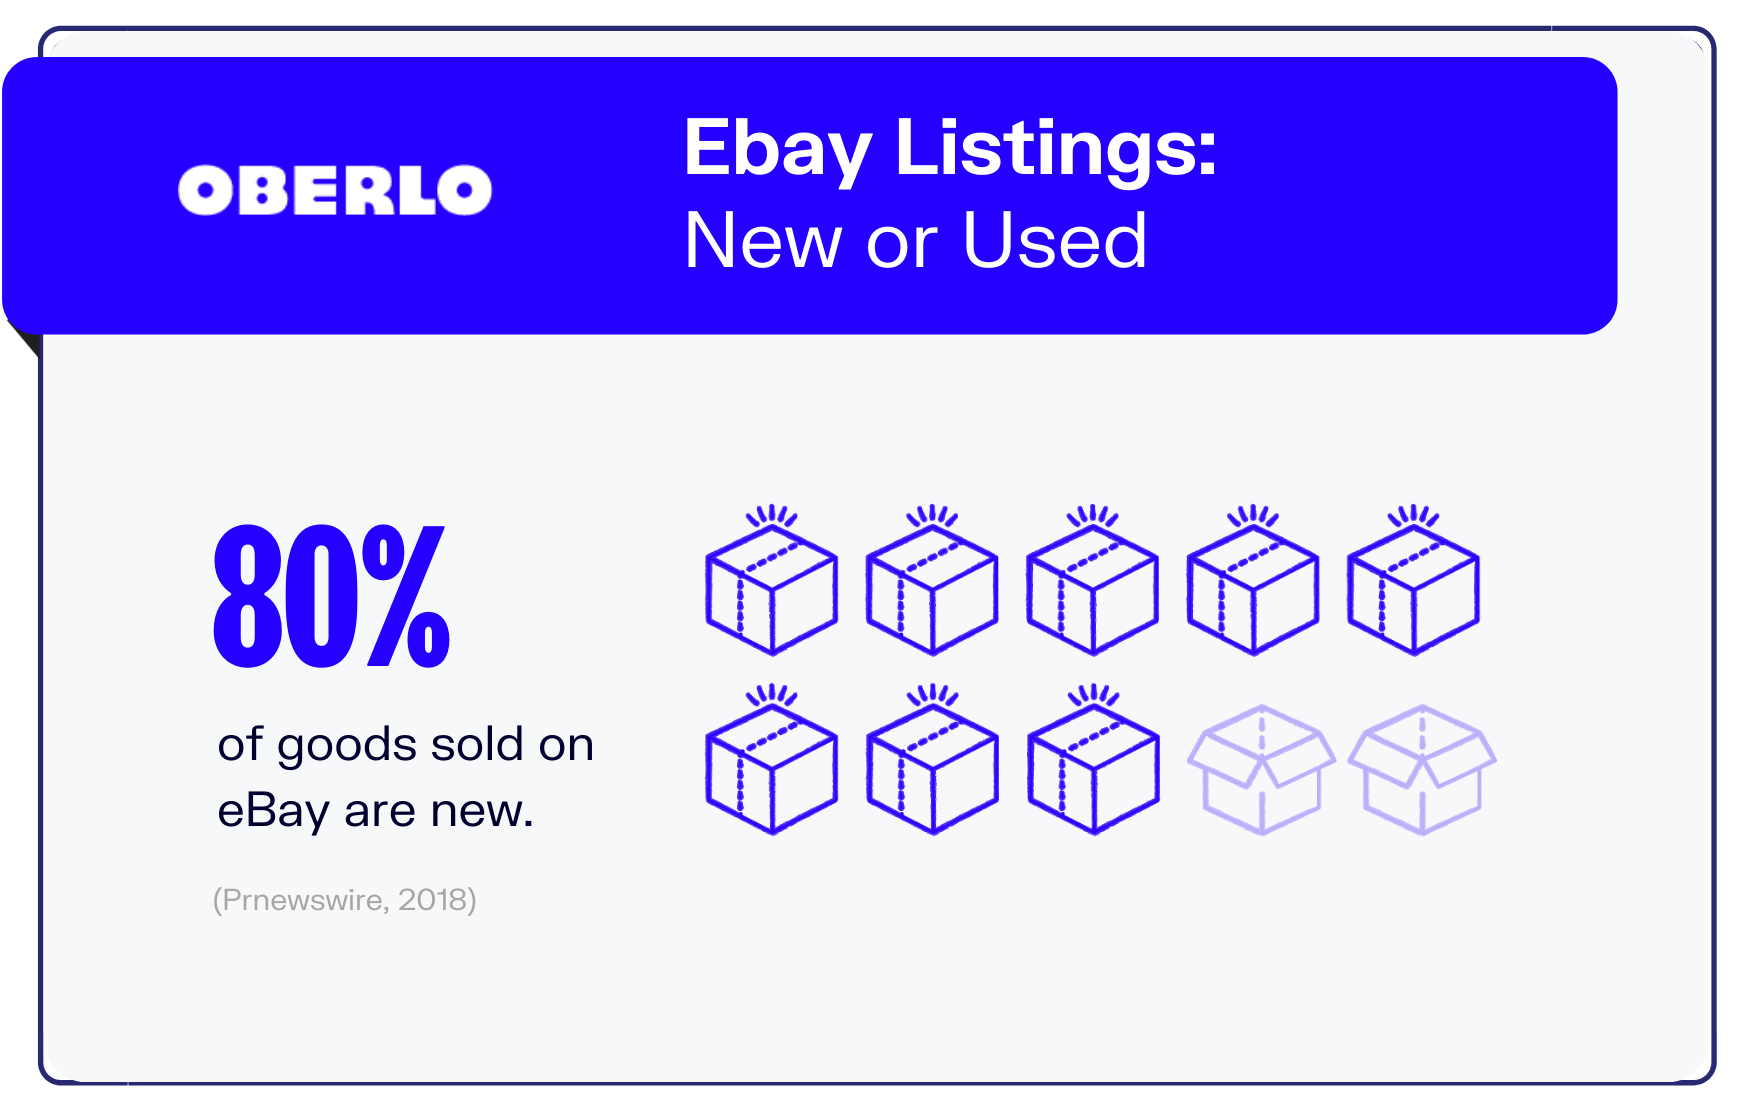 ebay statistics graphic 9